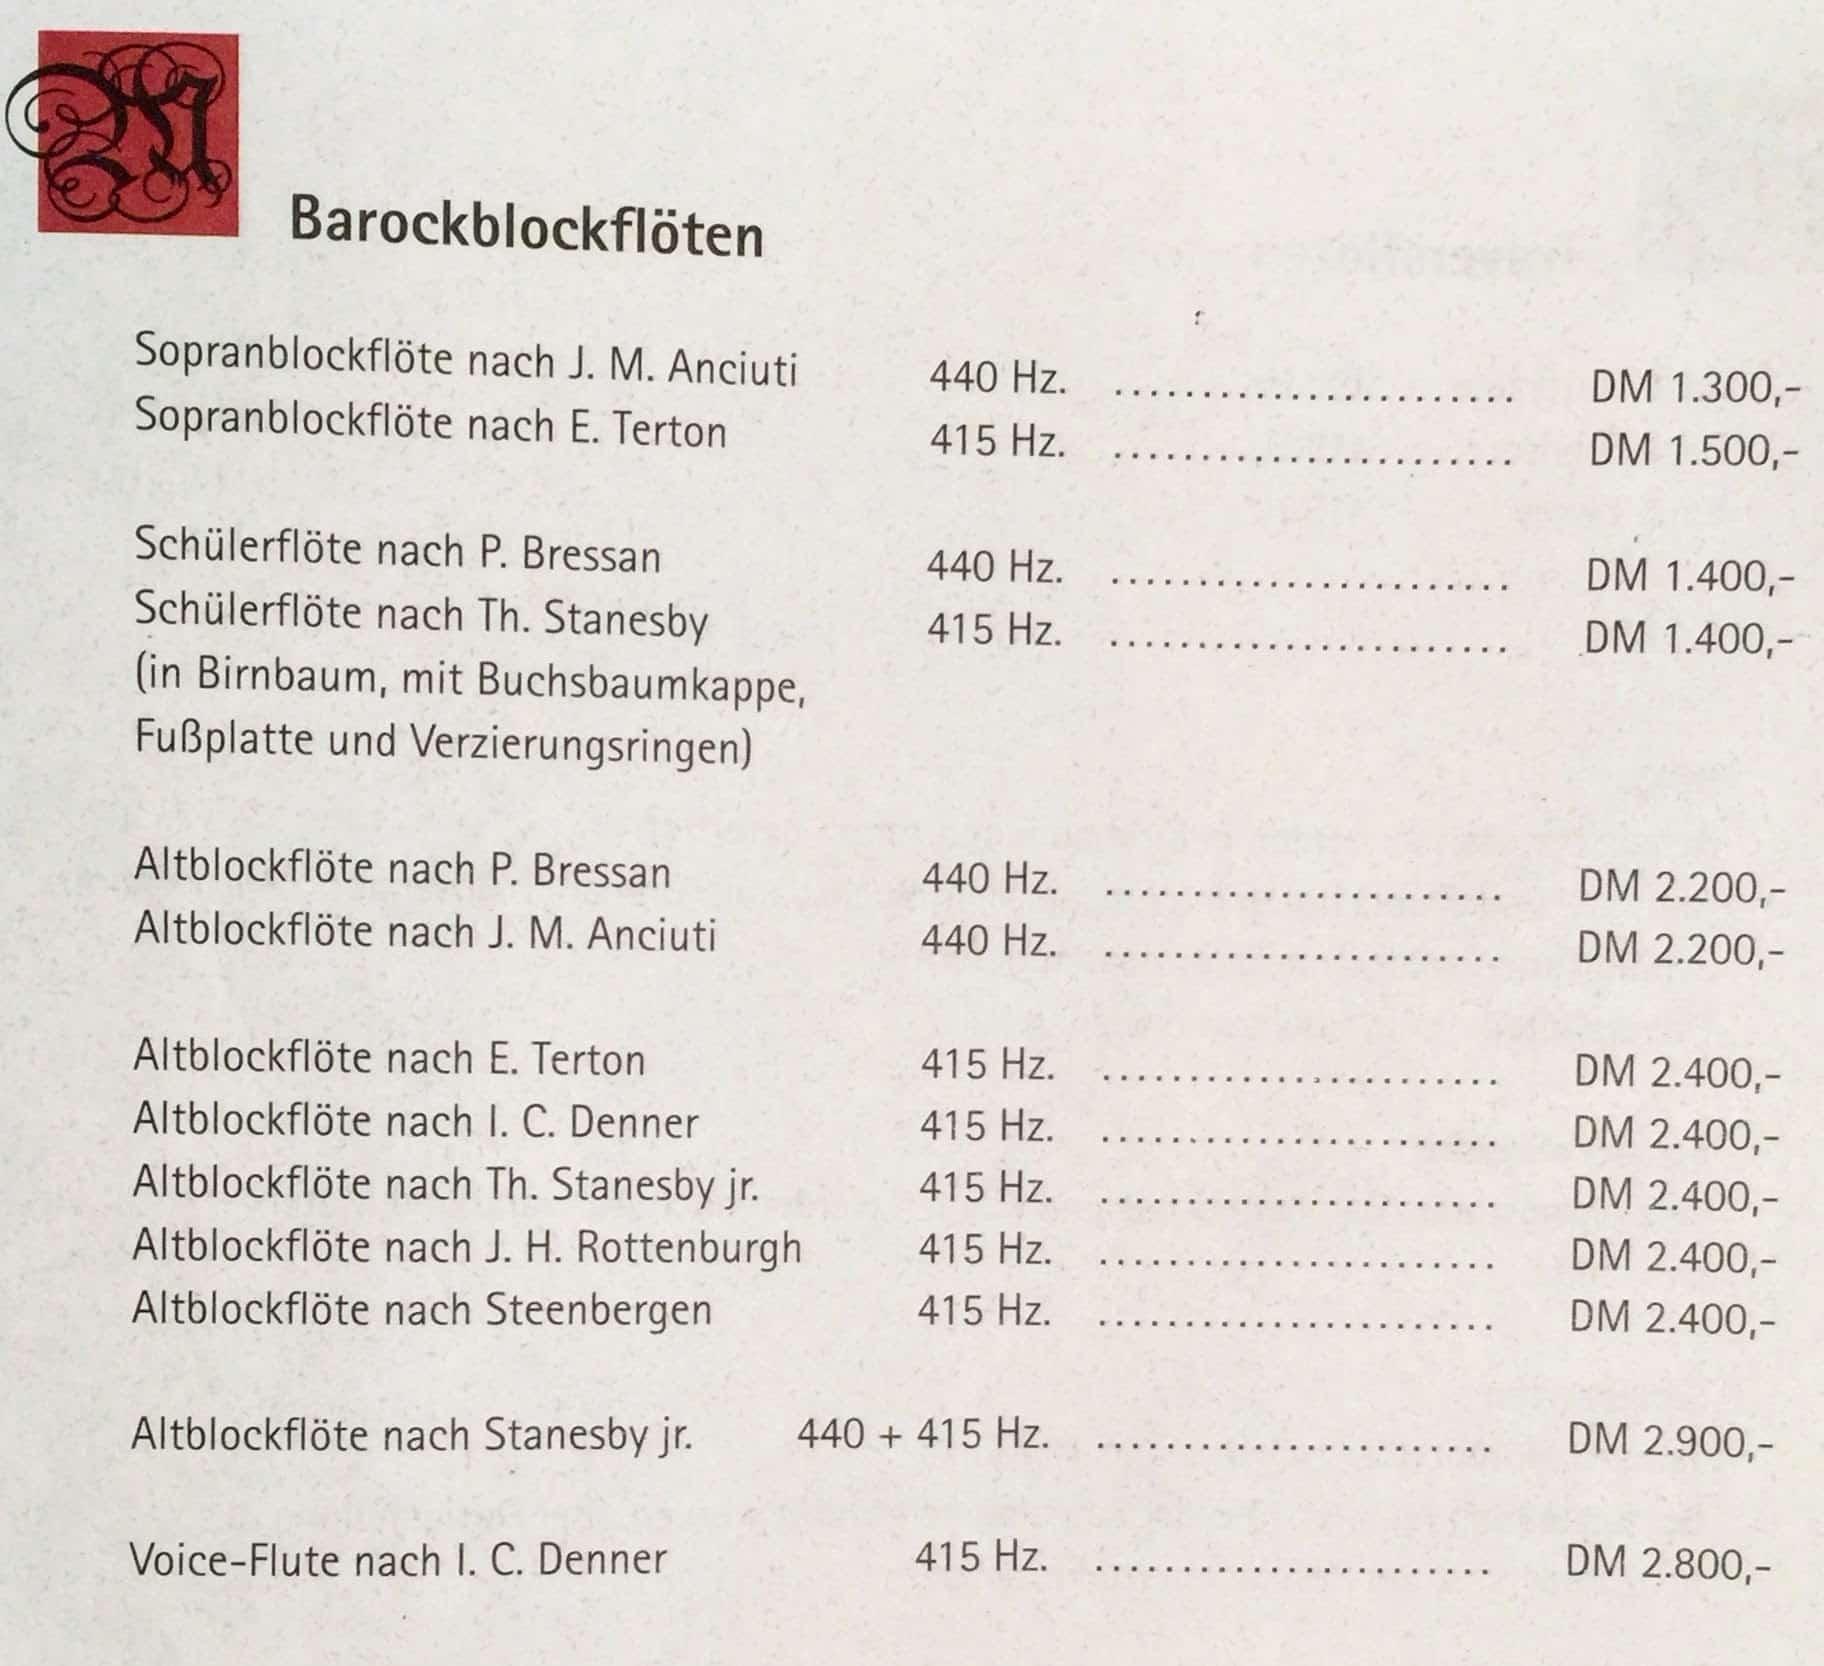 Gerd Melchers Preisliste Blockflöten 1993